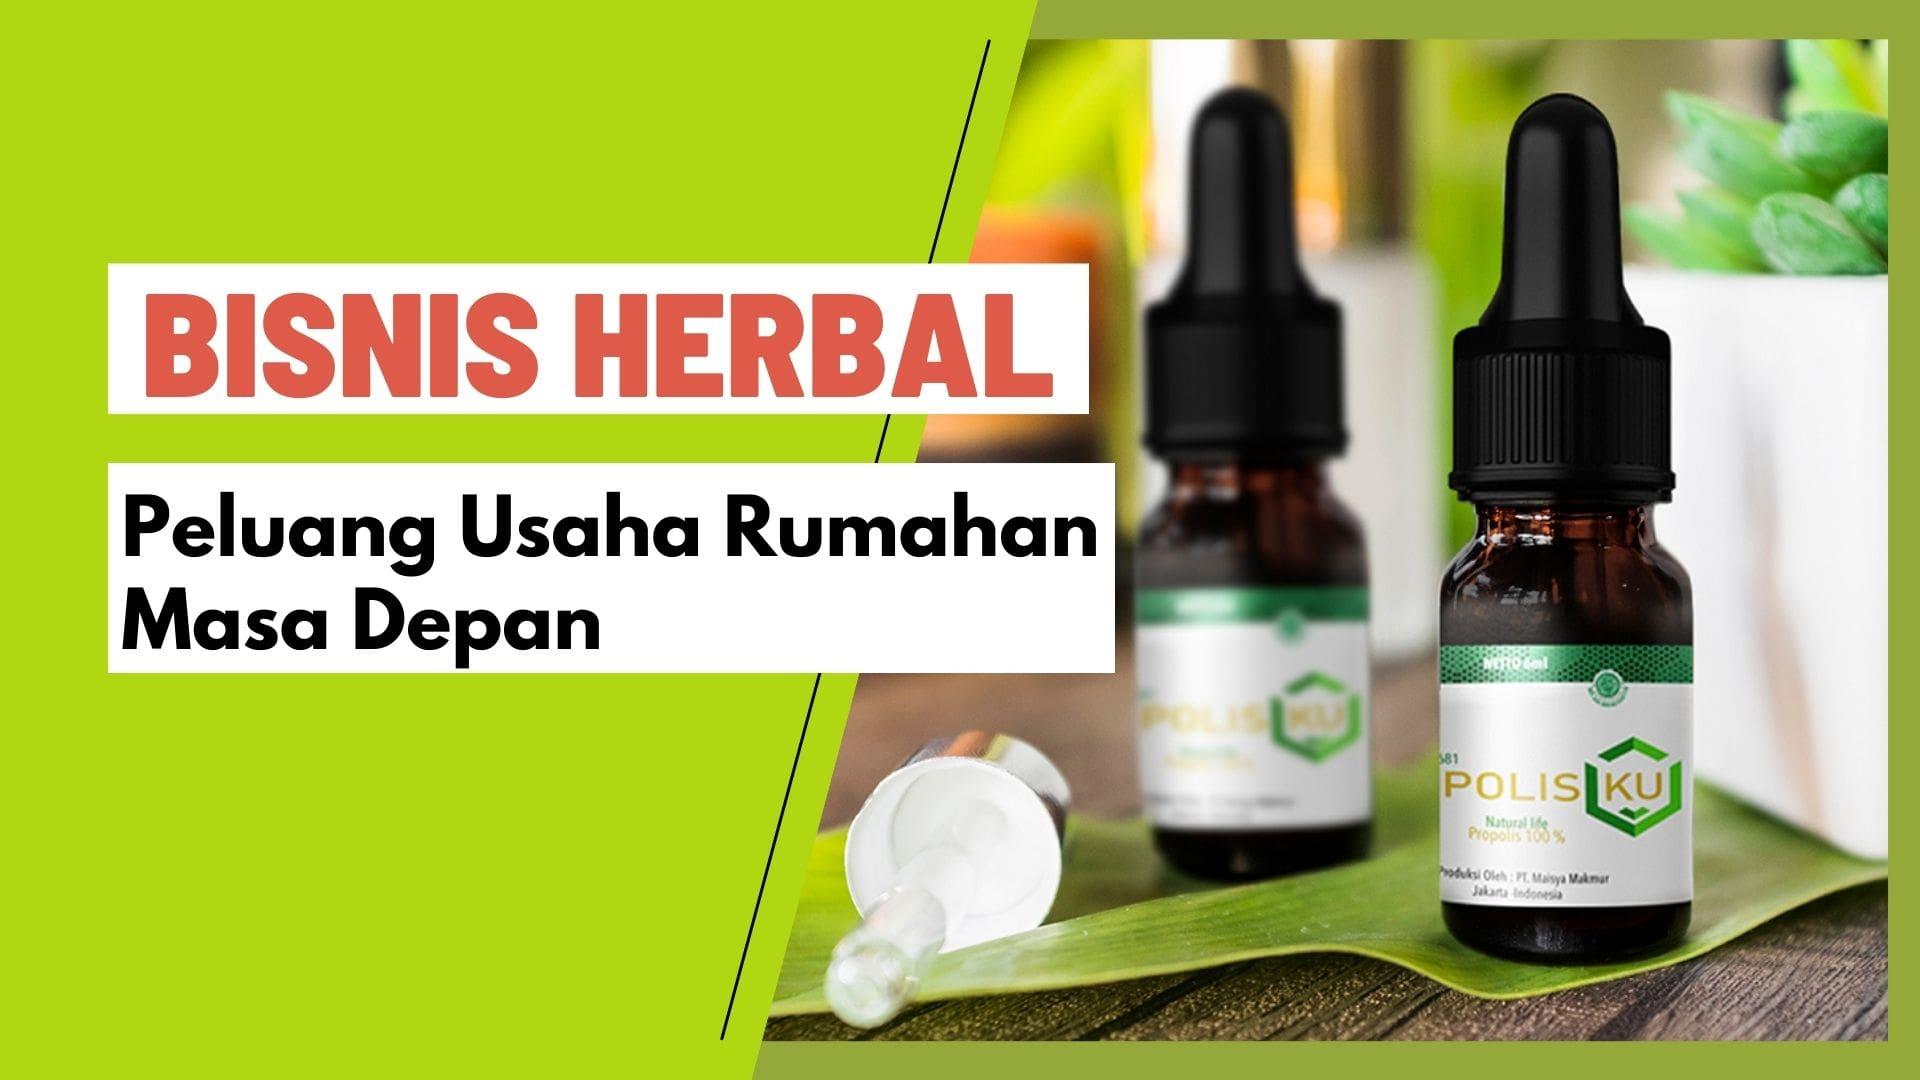 bisnis-herbal-peluang-usaha-rumahan